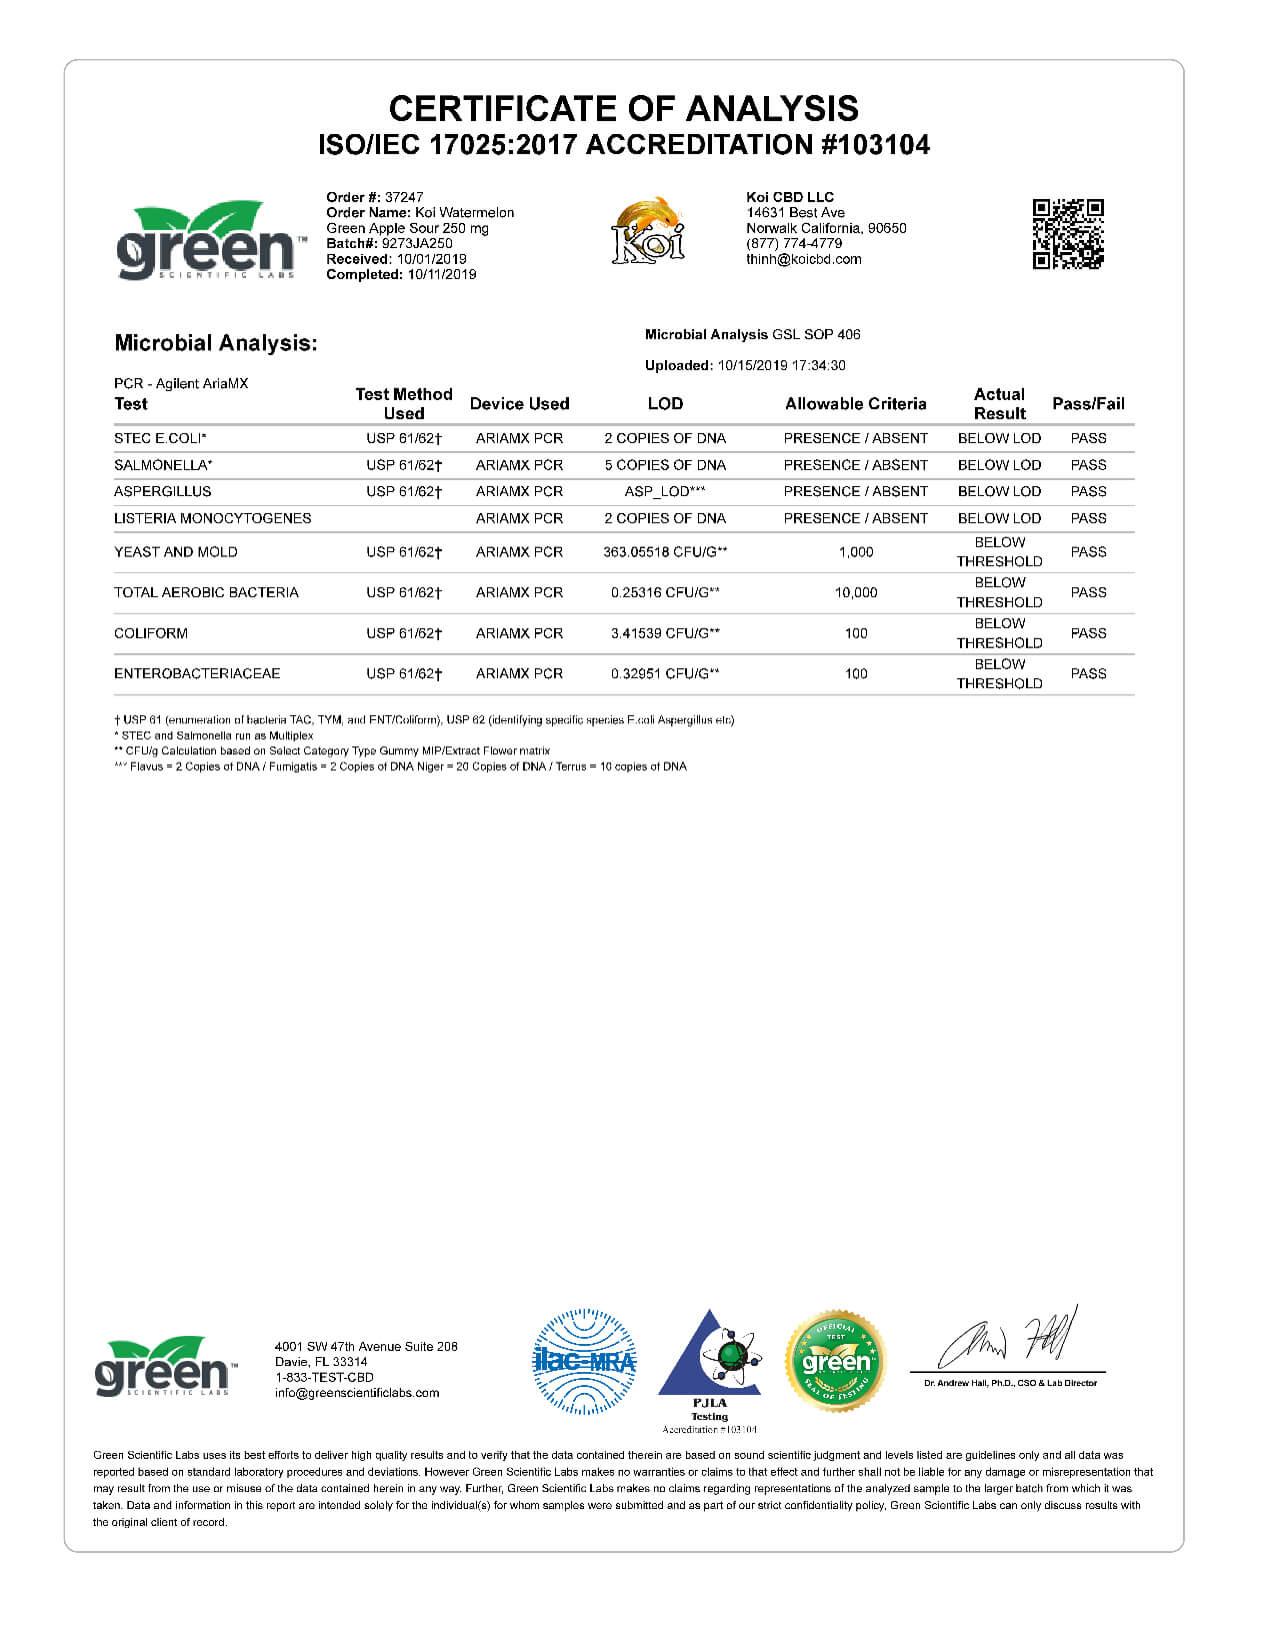 Koi CBD Watermelon Green Apple Sour Vape Oil 250mg page5